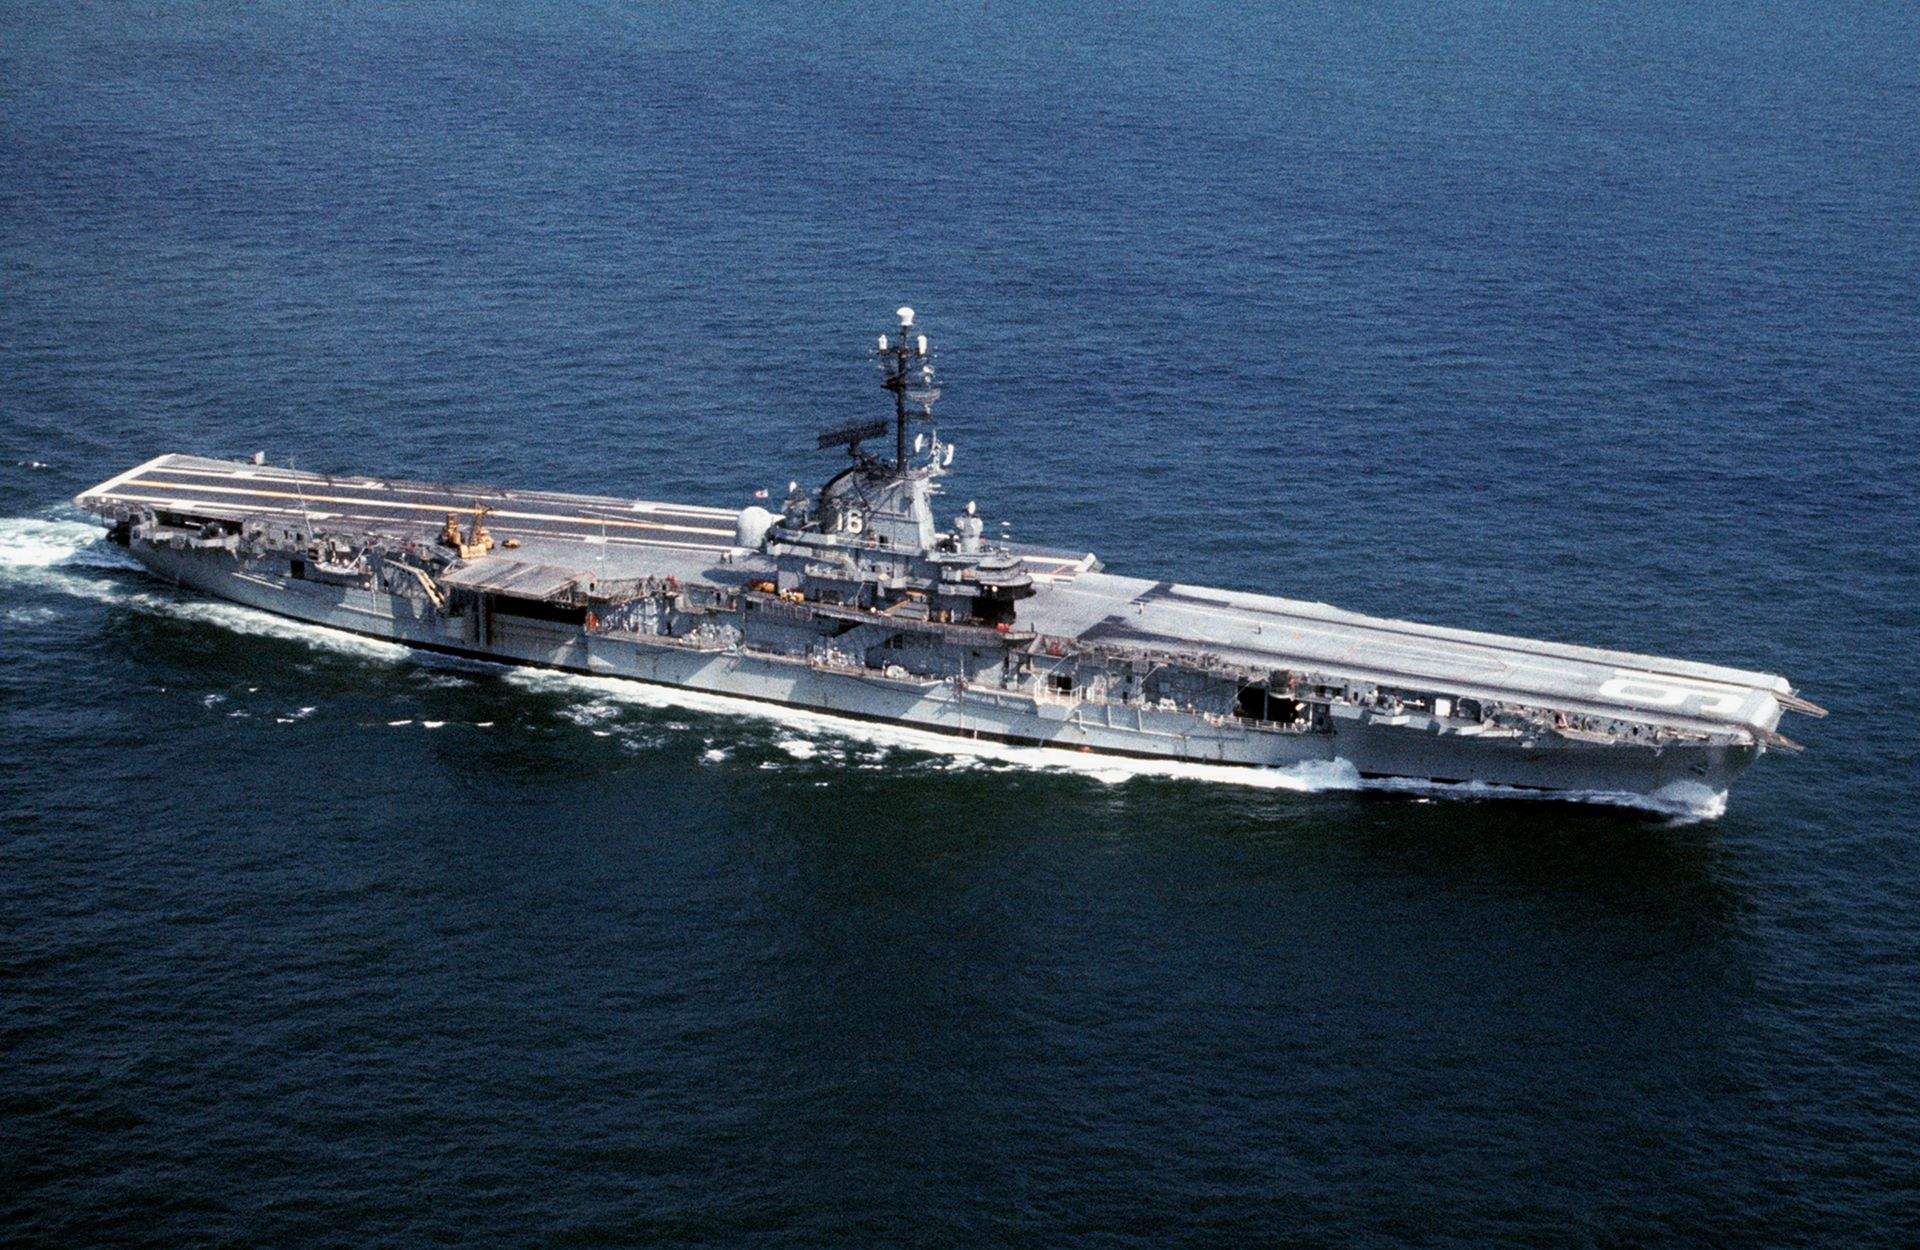 USS_Lexington_(CVS-16)_underway_in_the_1960s.JPEG